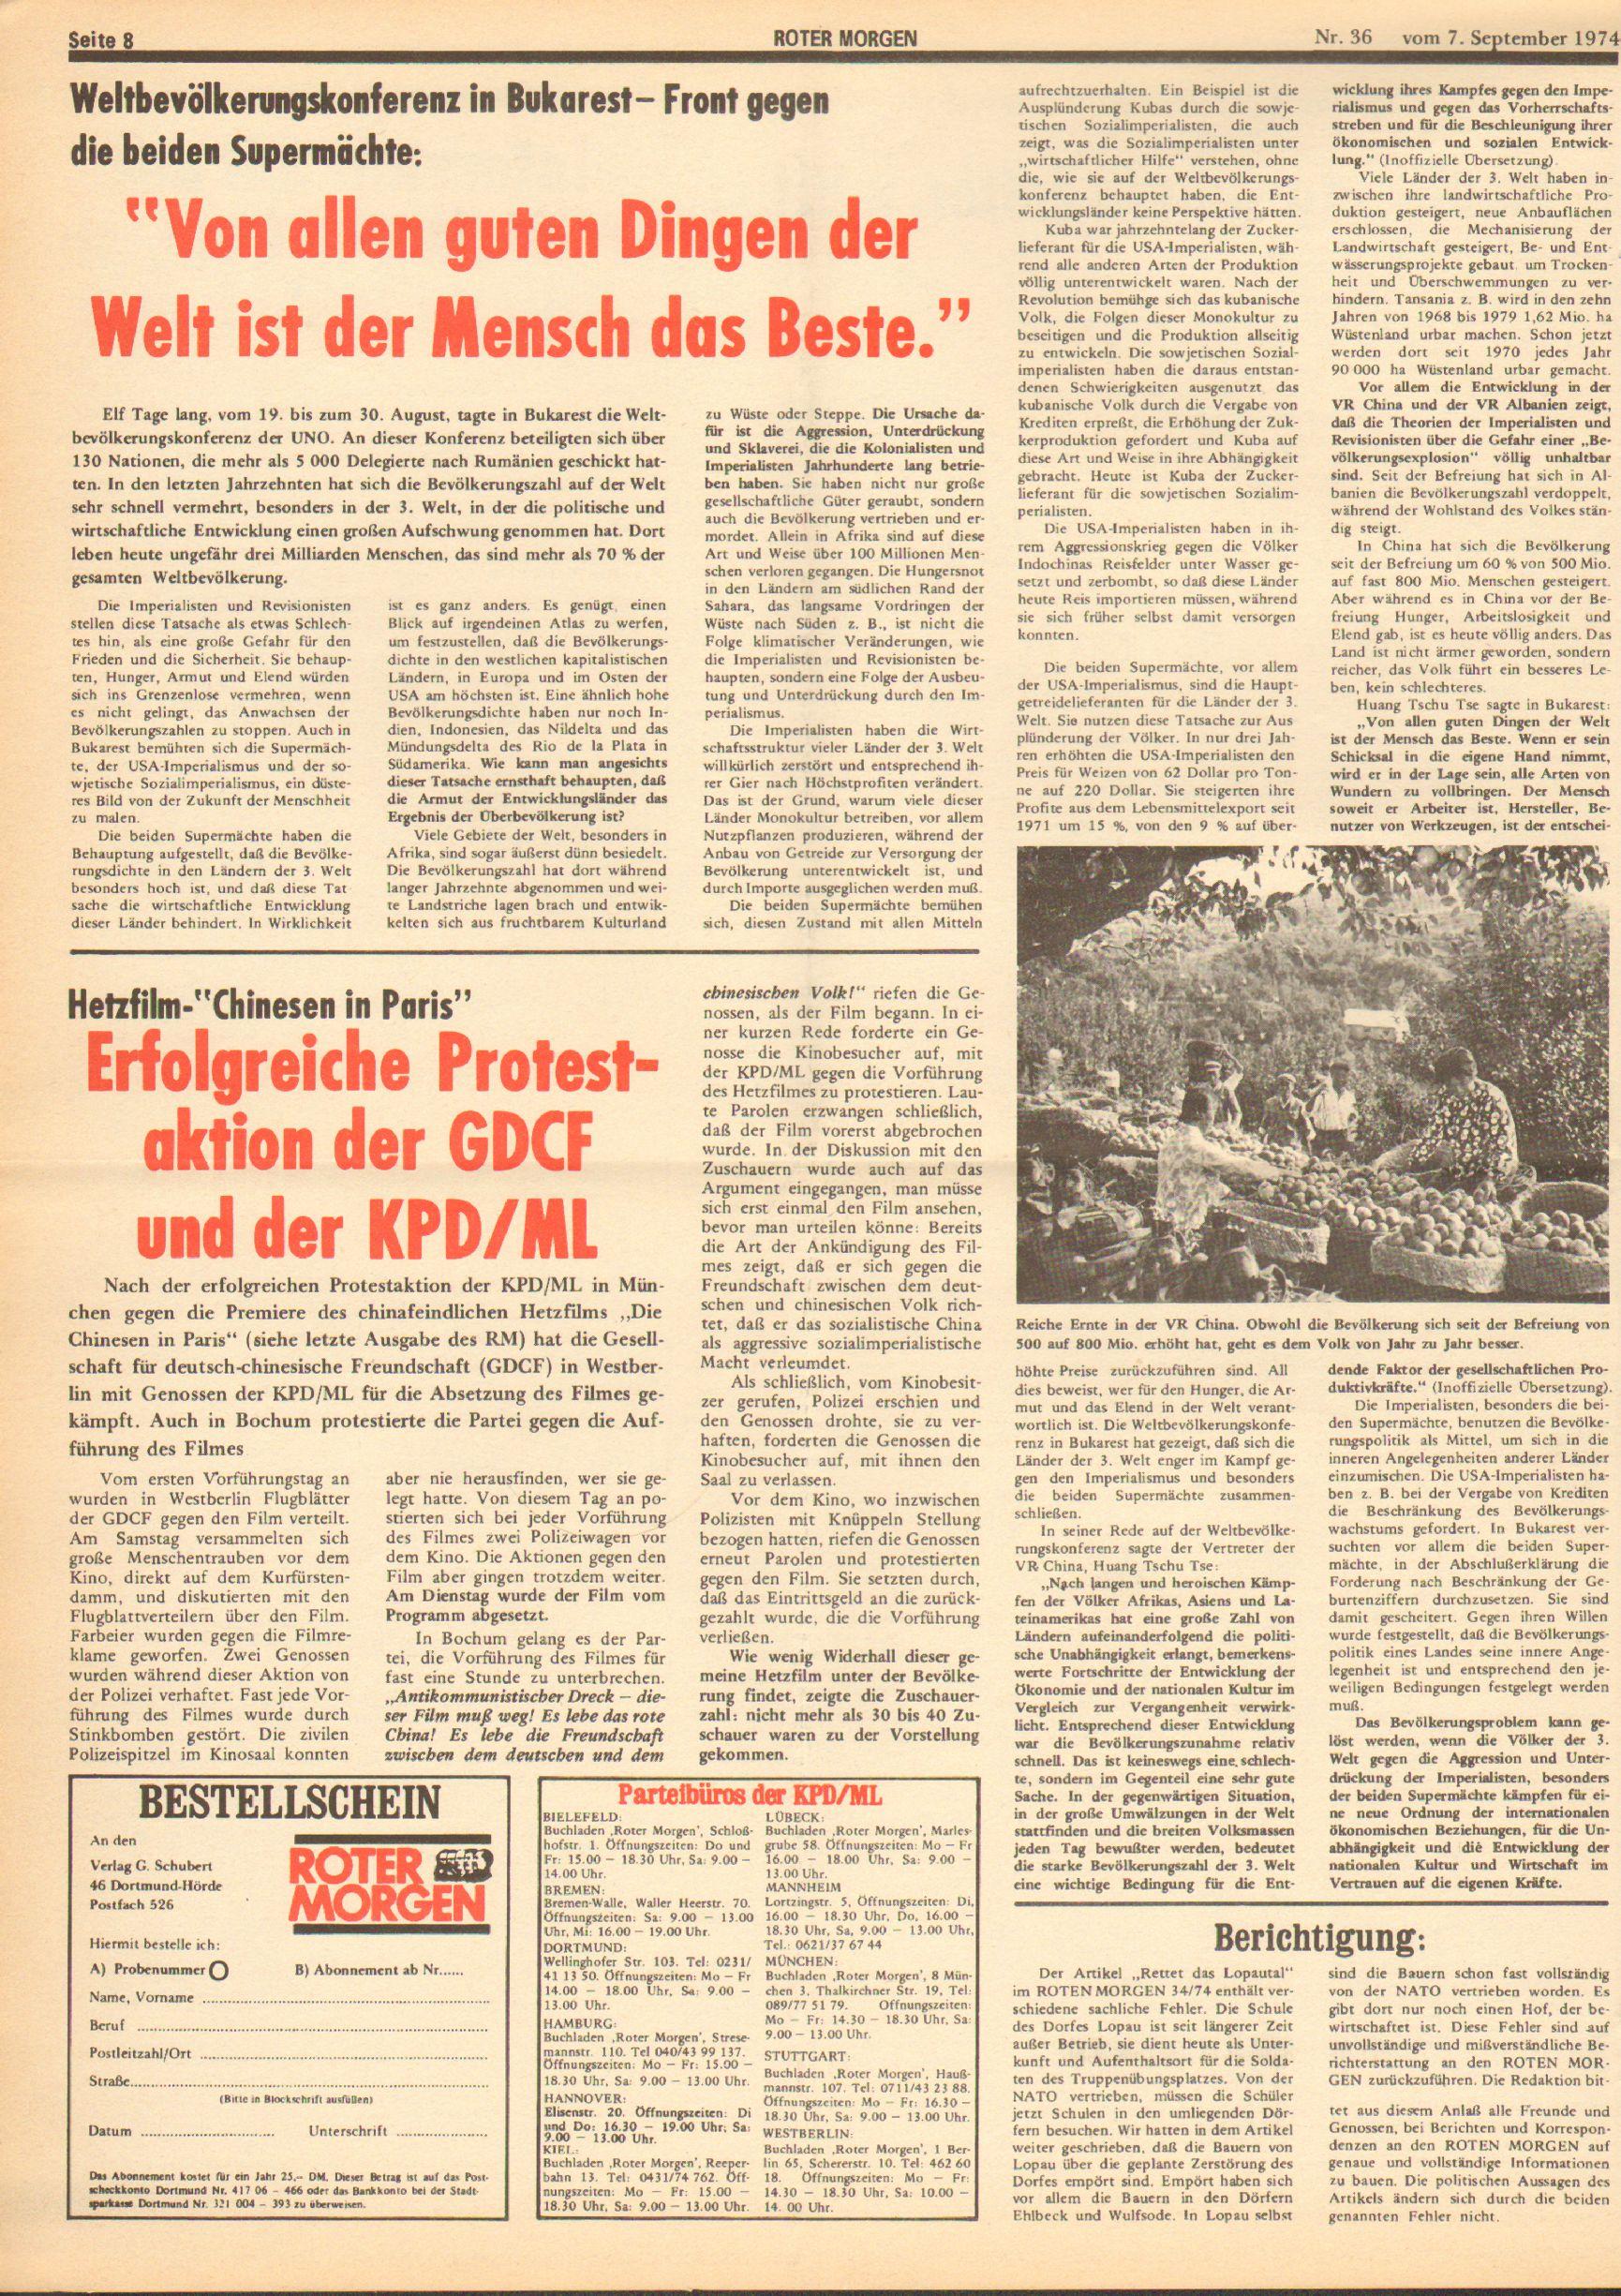 Roter Morgen, 8. Jg., 7. September 1974, Nr. 36, Seite 8